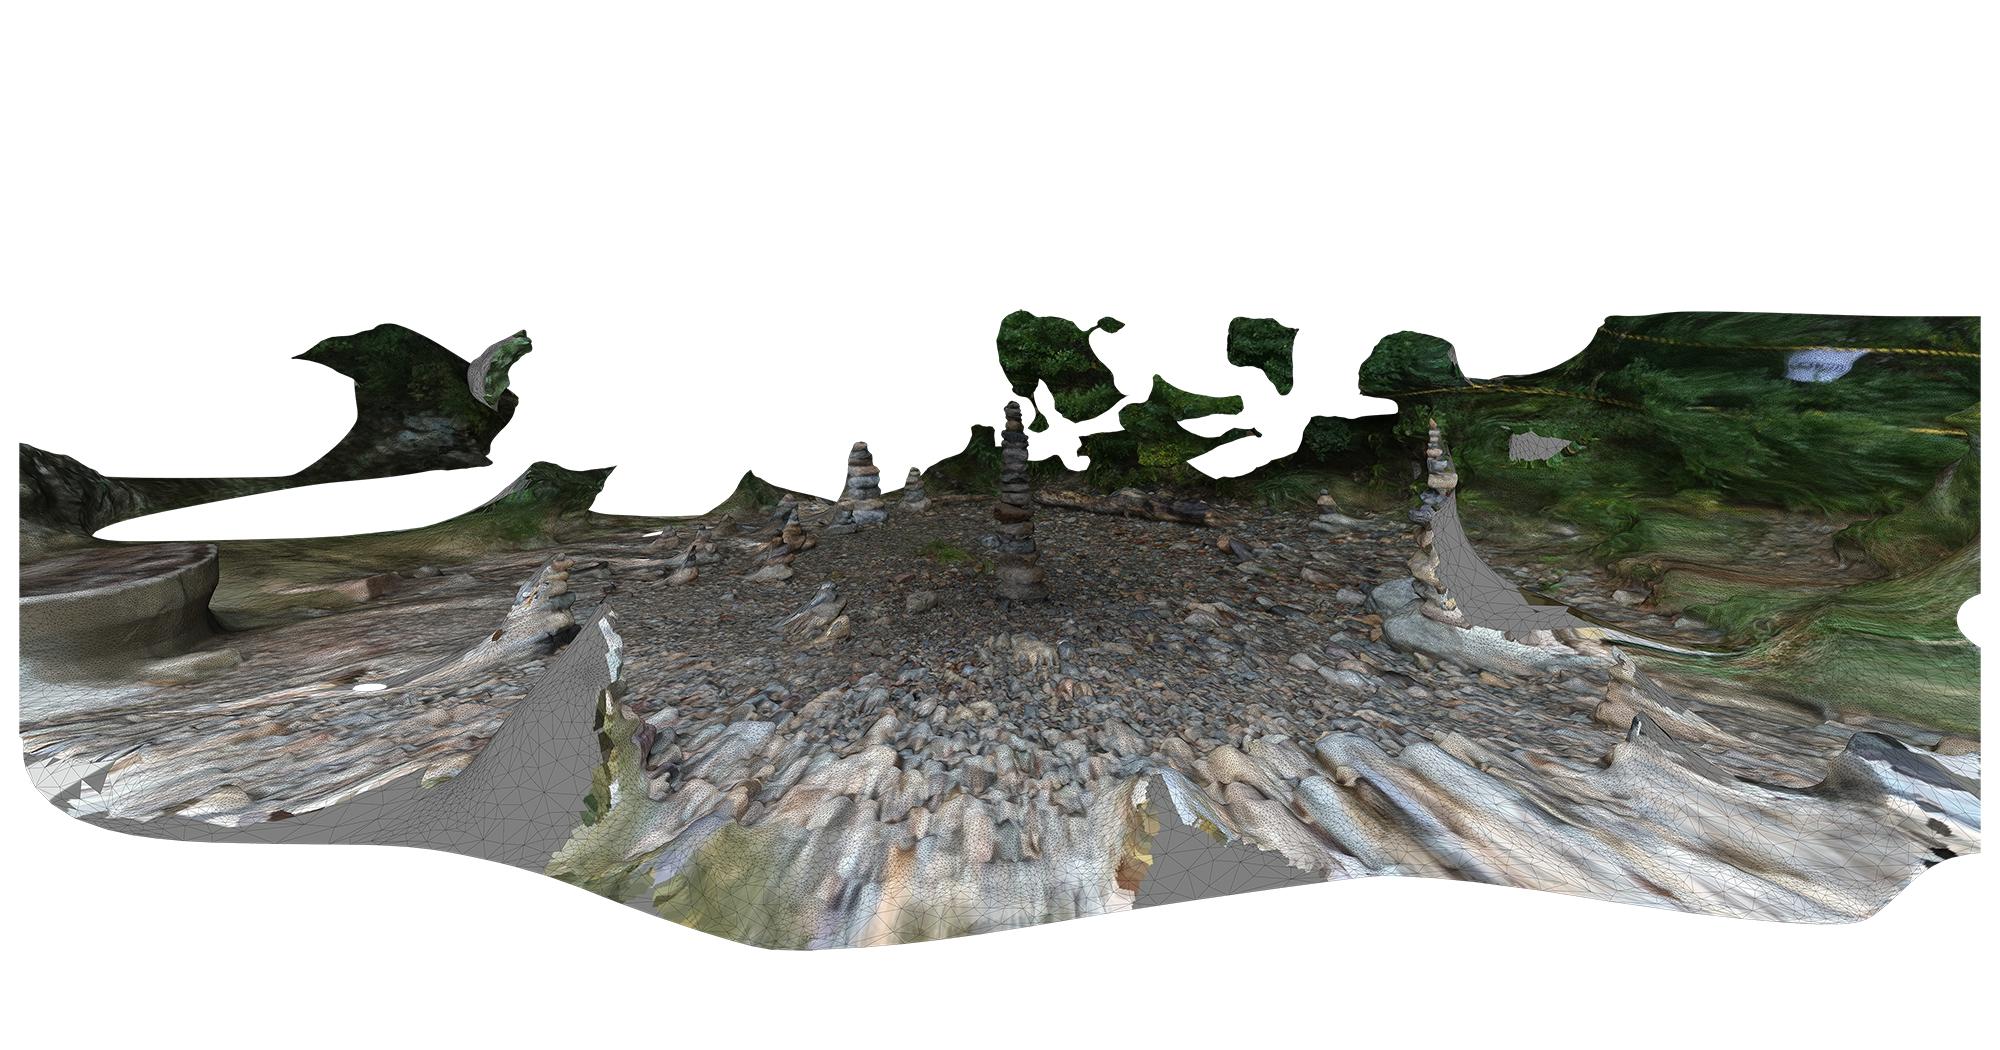 stone9_realmesh 2 (21X40cm 300dpi)